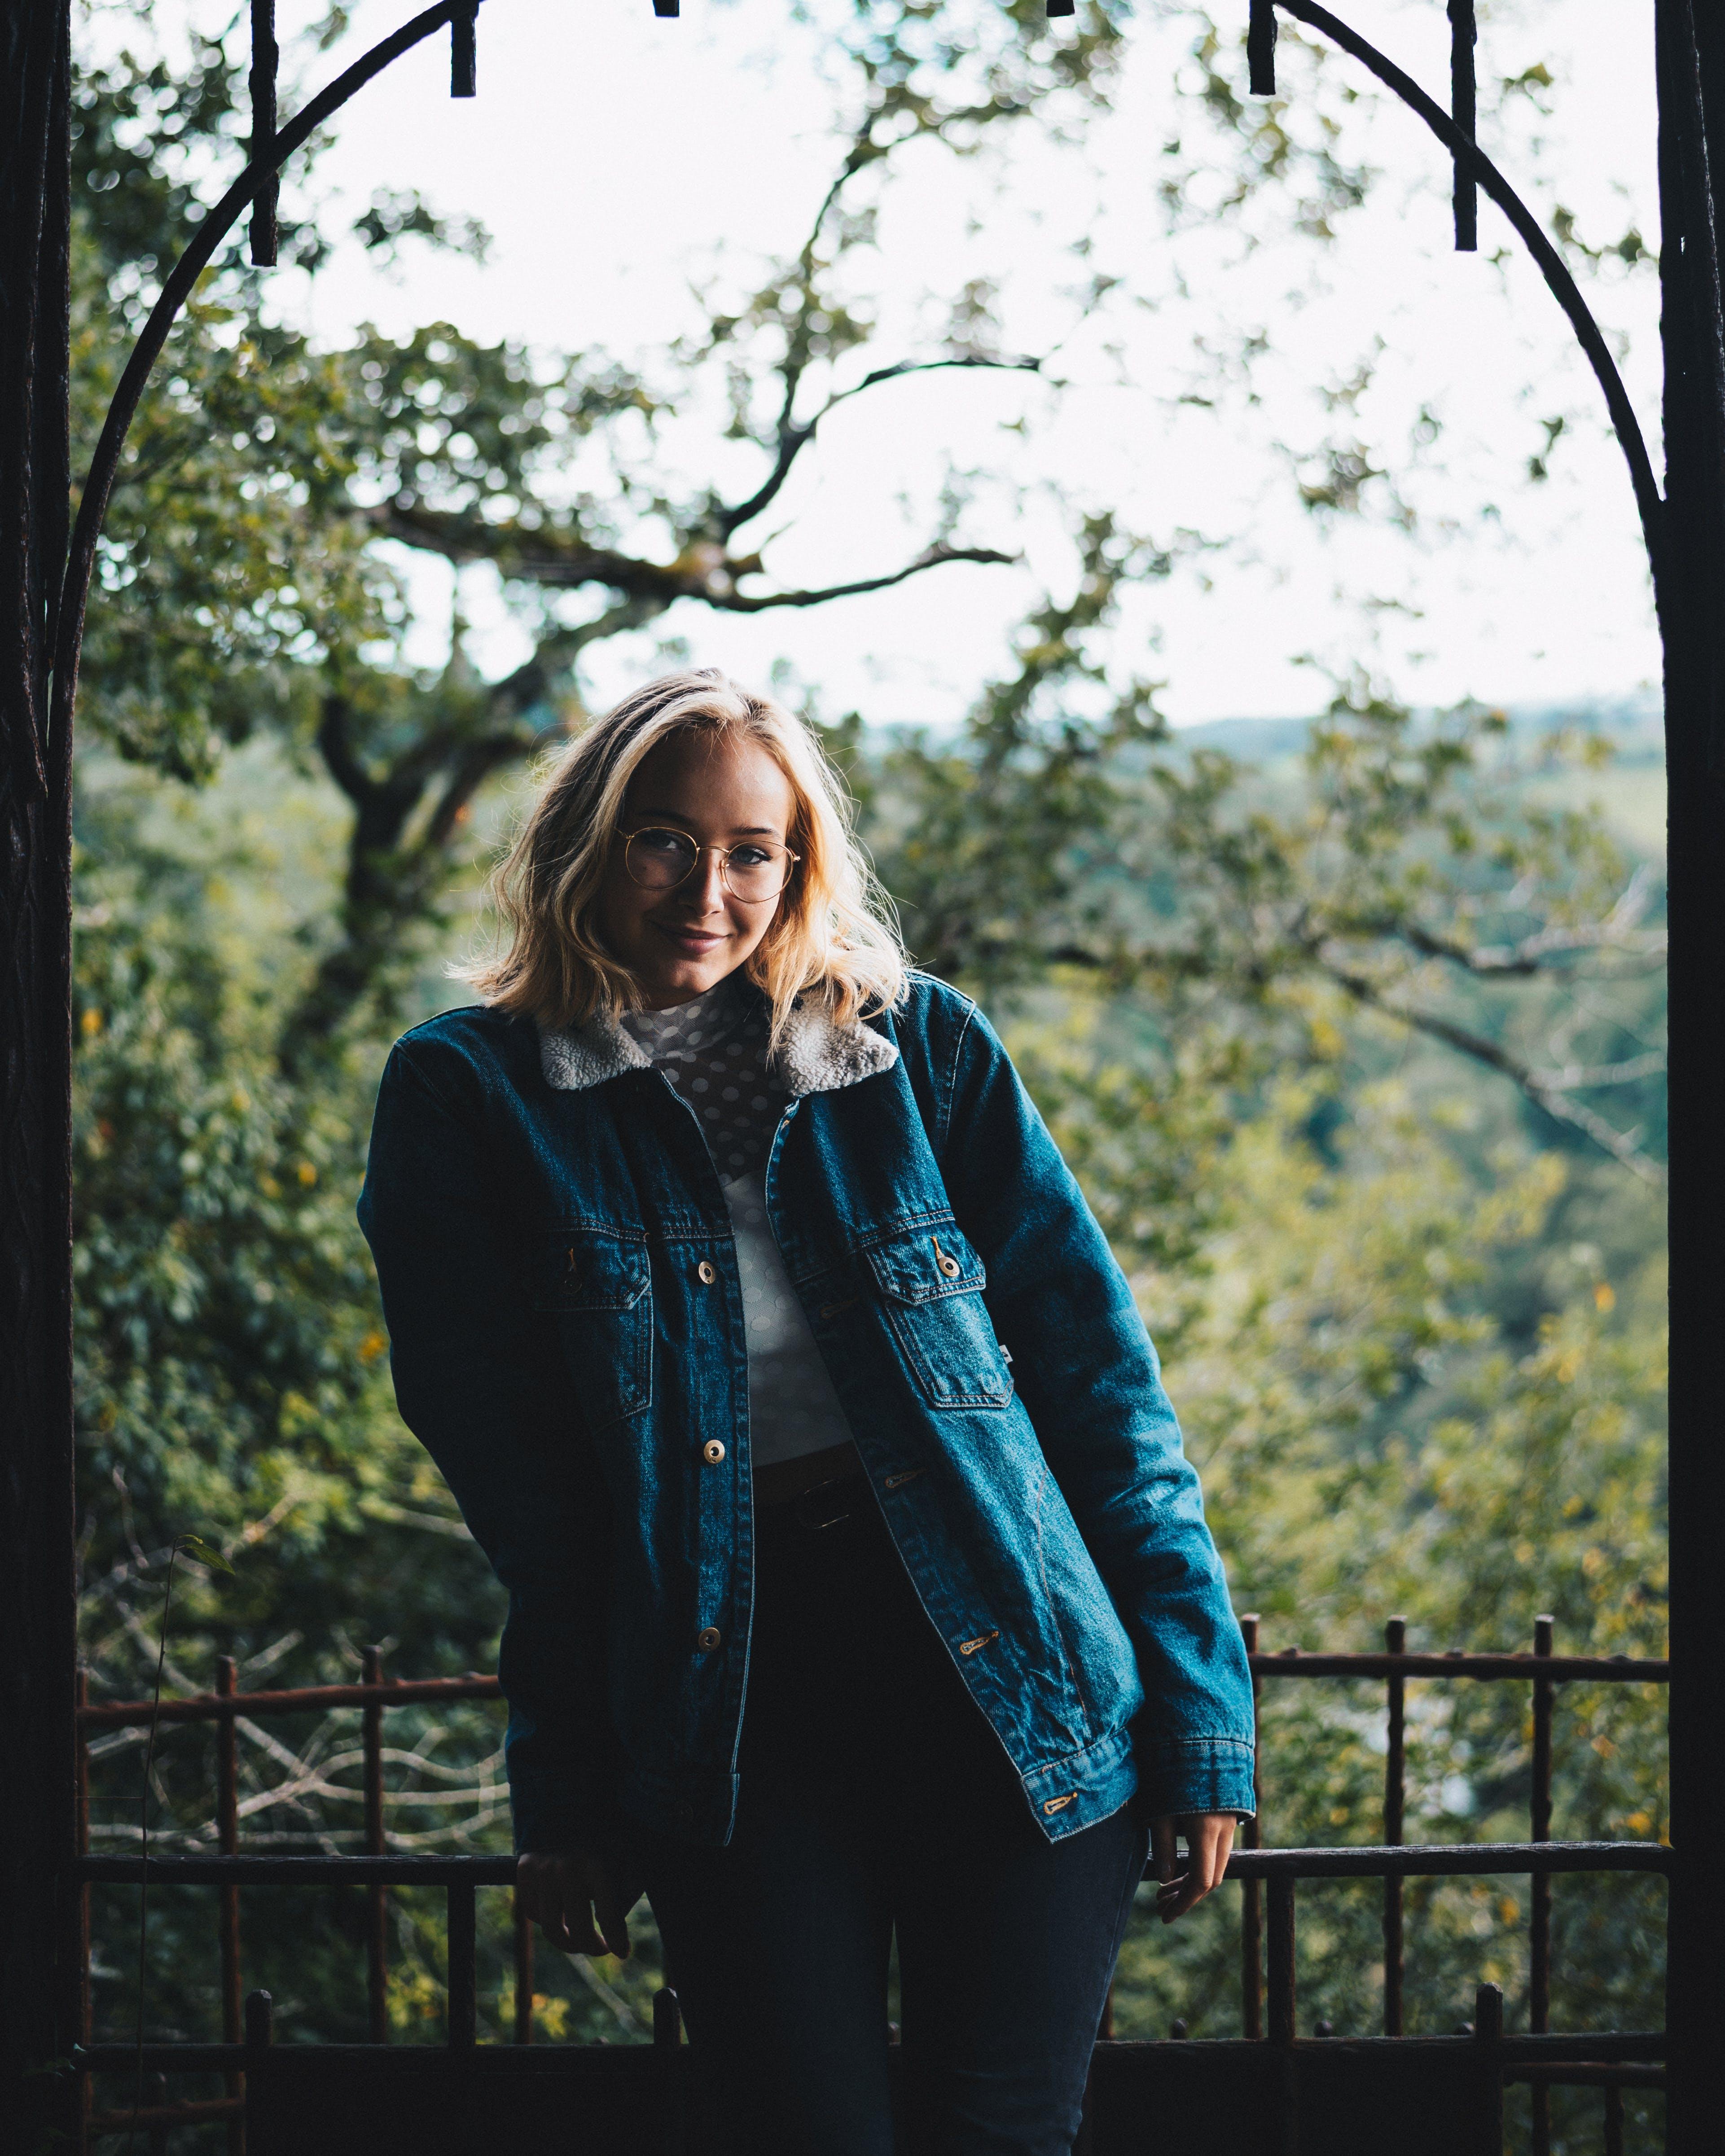 Photo of Woman Wearing Denim Jacket